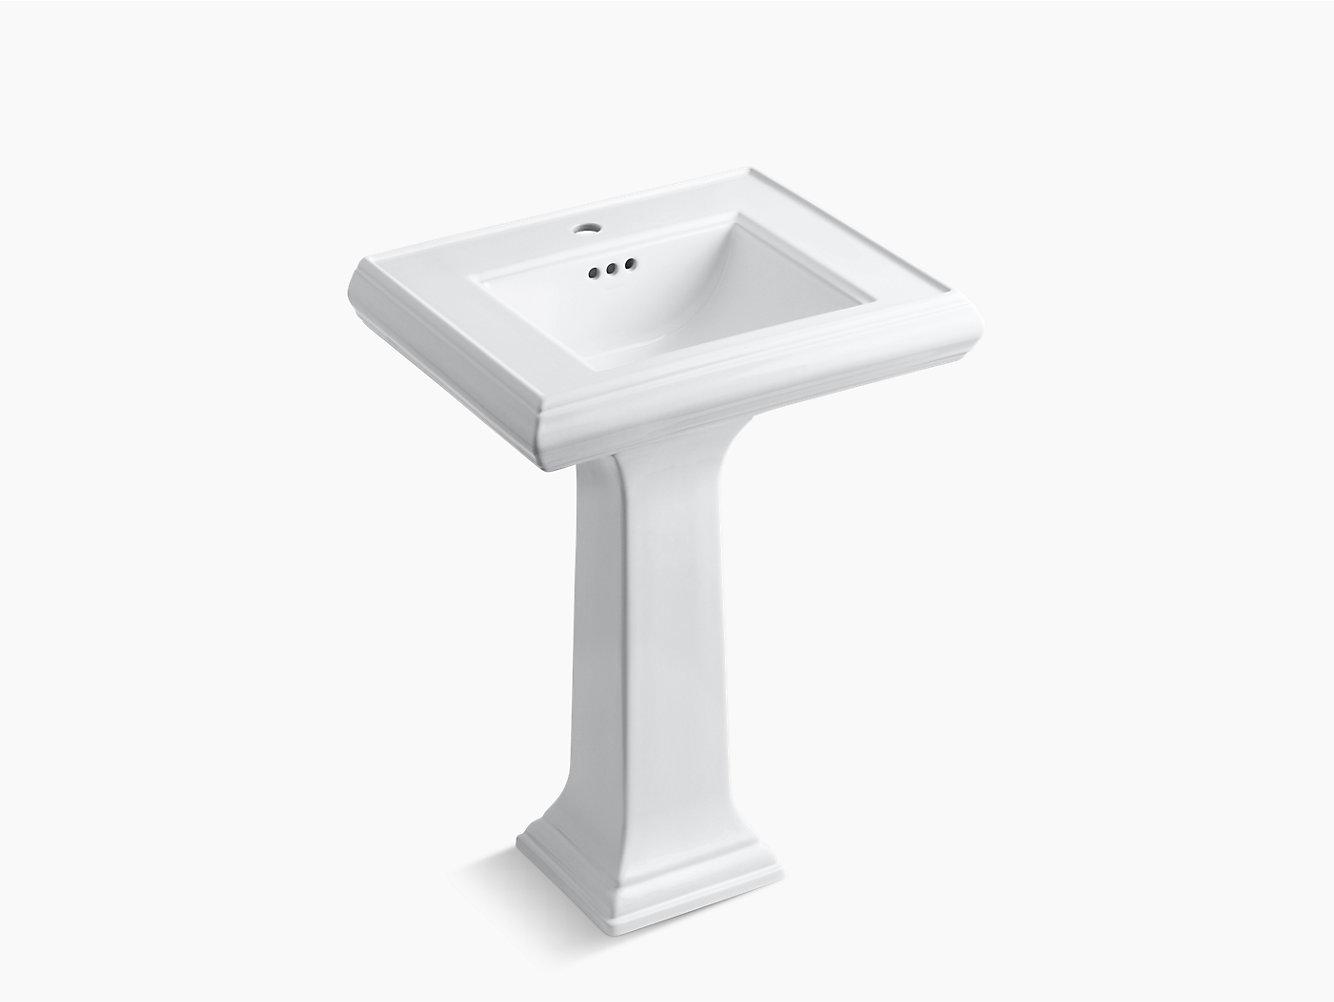 Kohler Memoirs Pedestal Sink Corner Sink Small Befon For White U0026 Gray Bathroom Design With